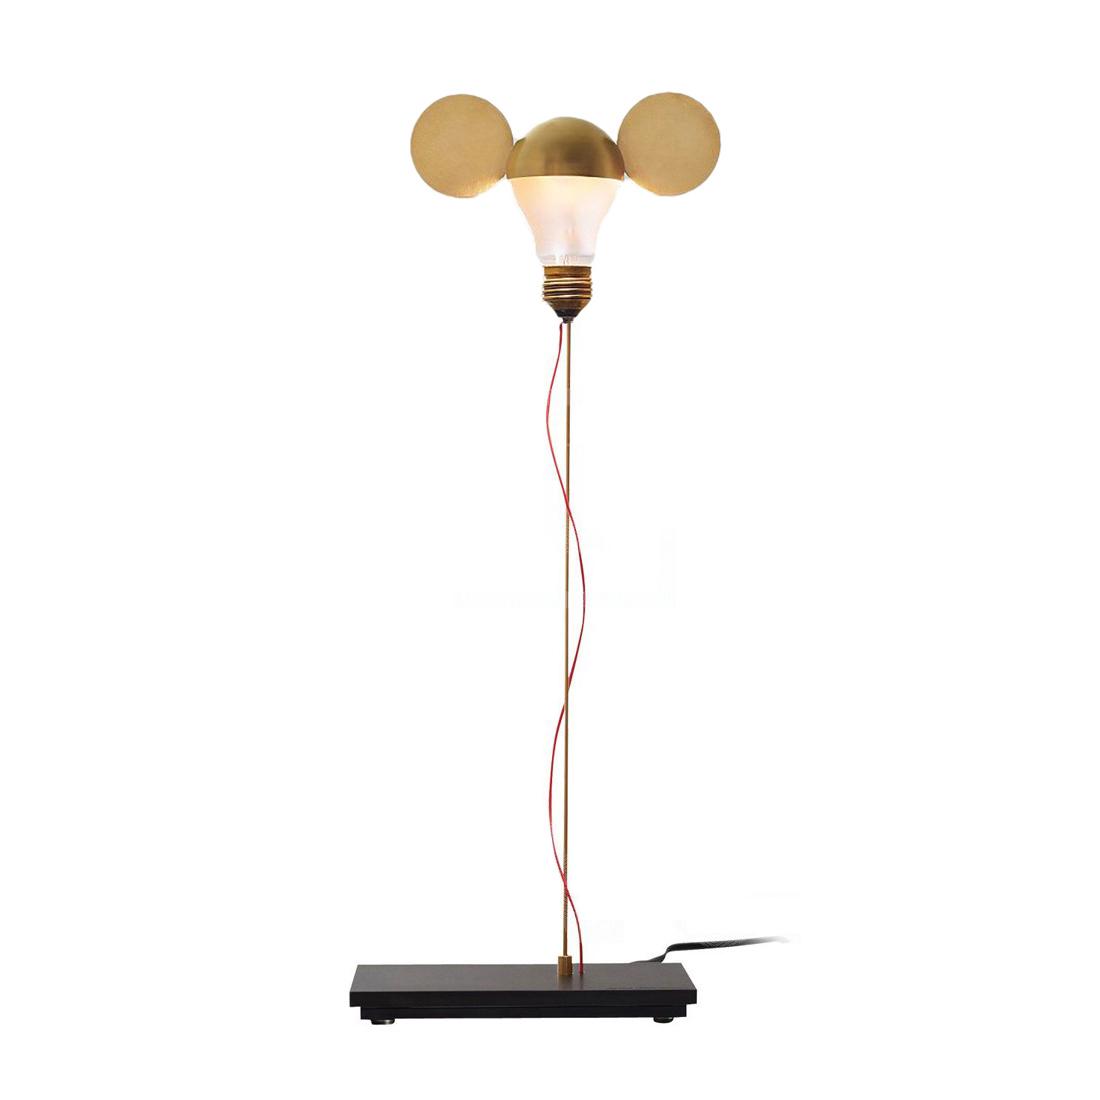 INGO MAURER lampada da tavolo I RICCHI POVERI TOTO - MyAreaDesign.it